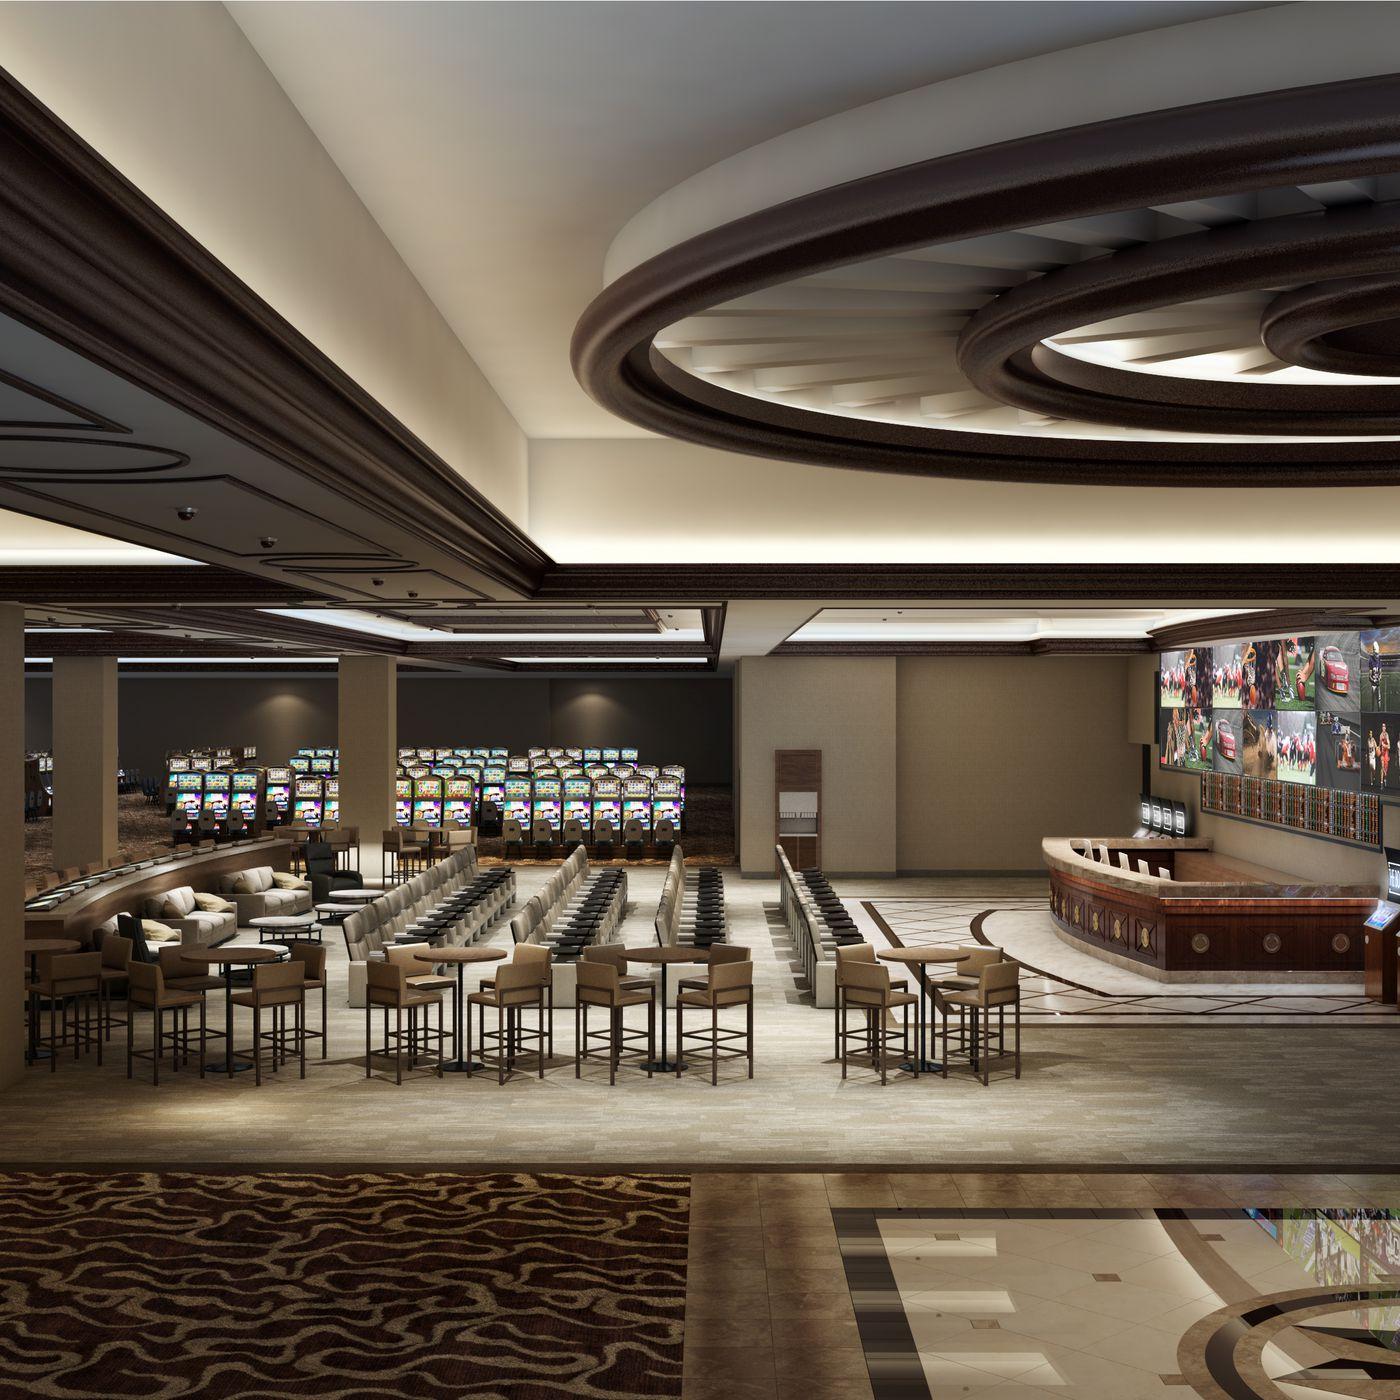 Horseshoe casino hammond louisiana play 2 player pool games